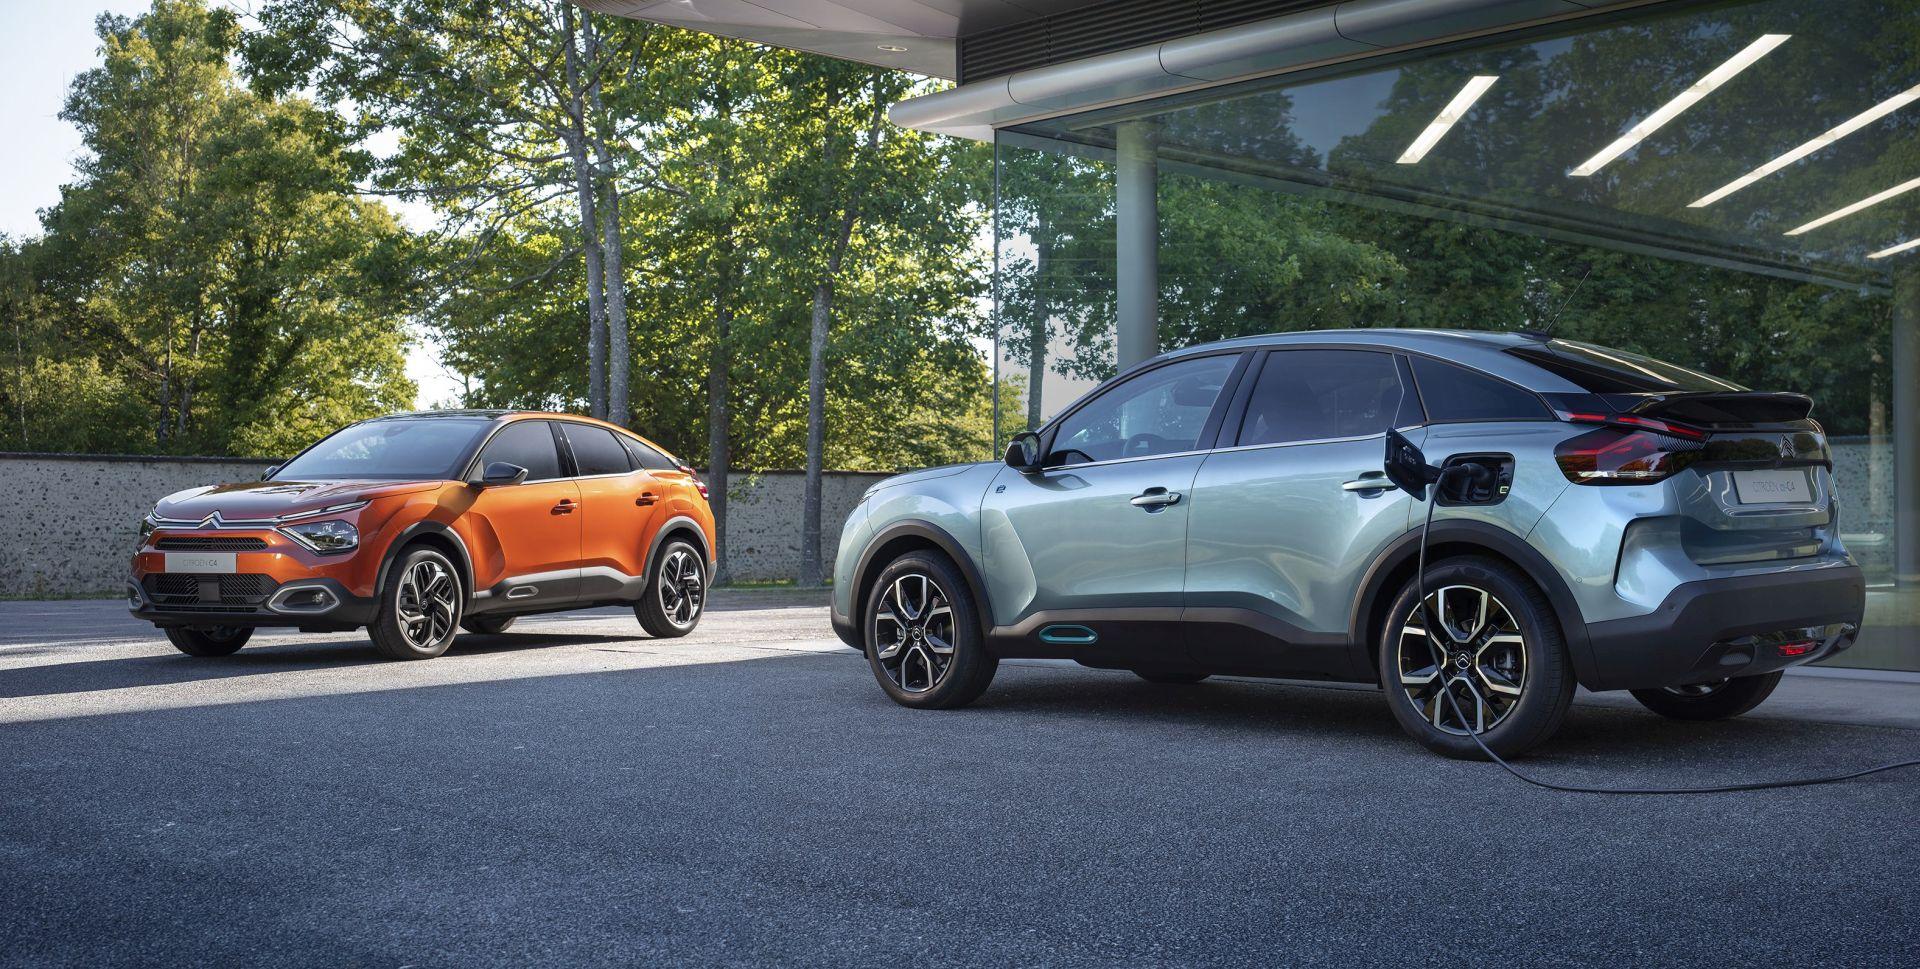 Nuevo Citroën C4: ¿Se inicia otra etapa en la era de los SUV? | Garantia Plus